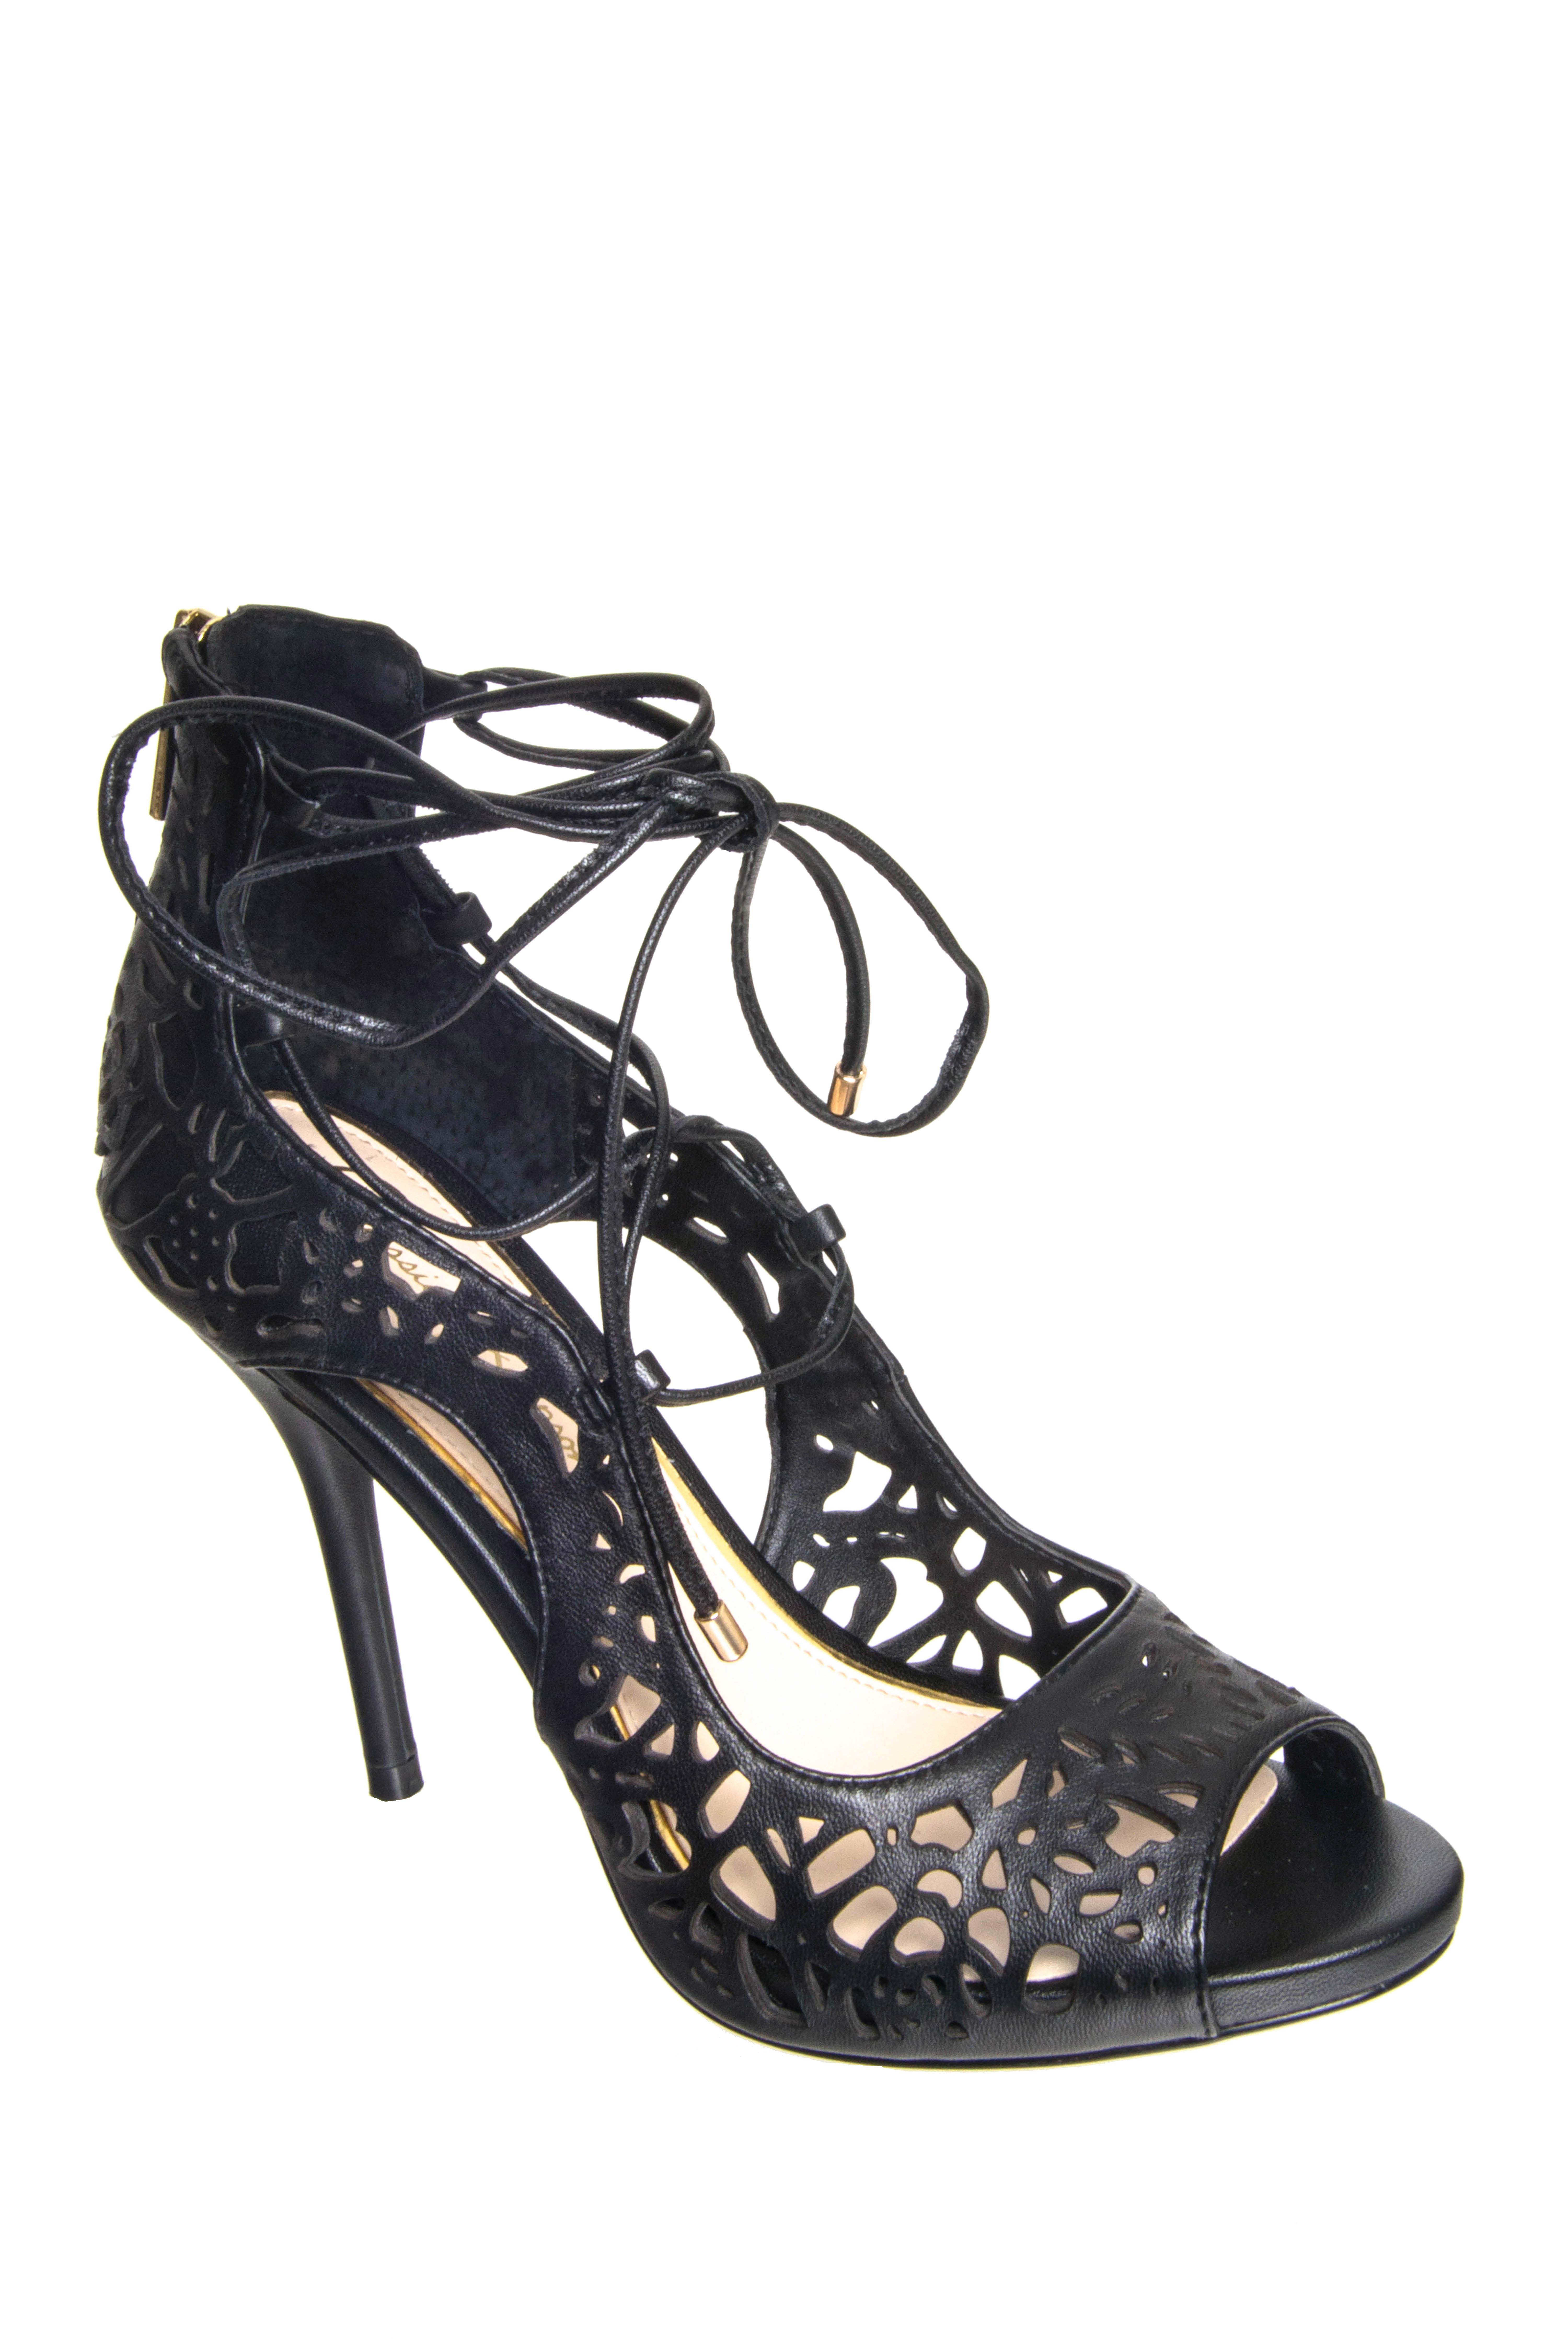 Jessica Simpson Briony High Heels - Black